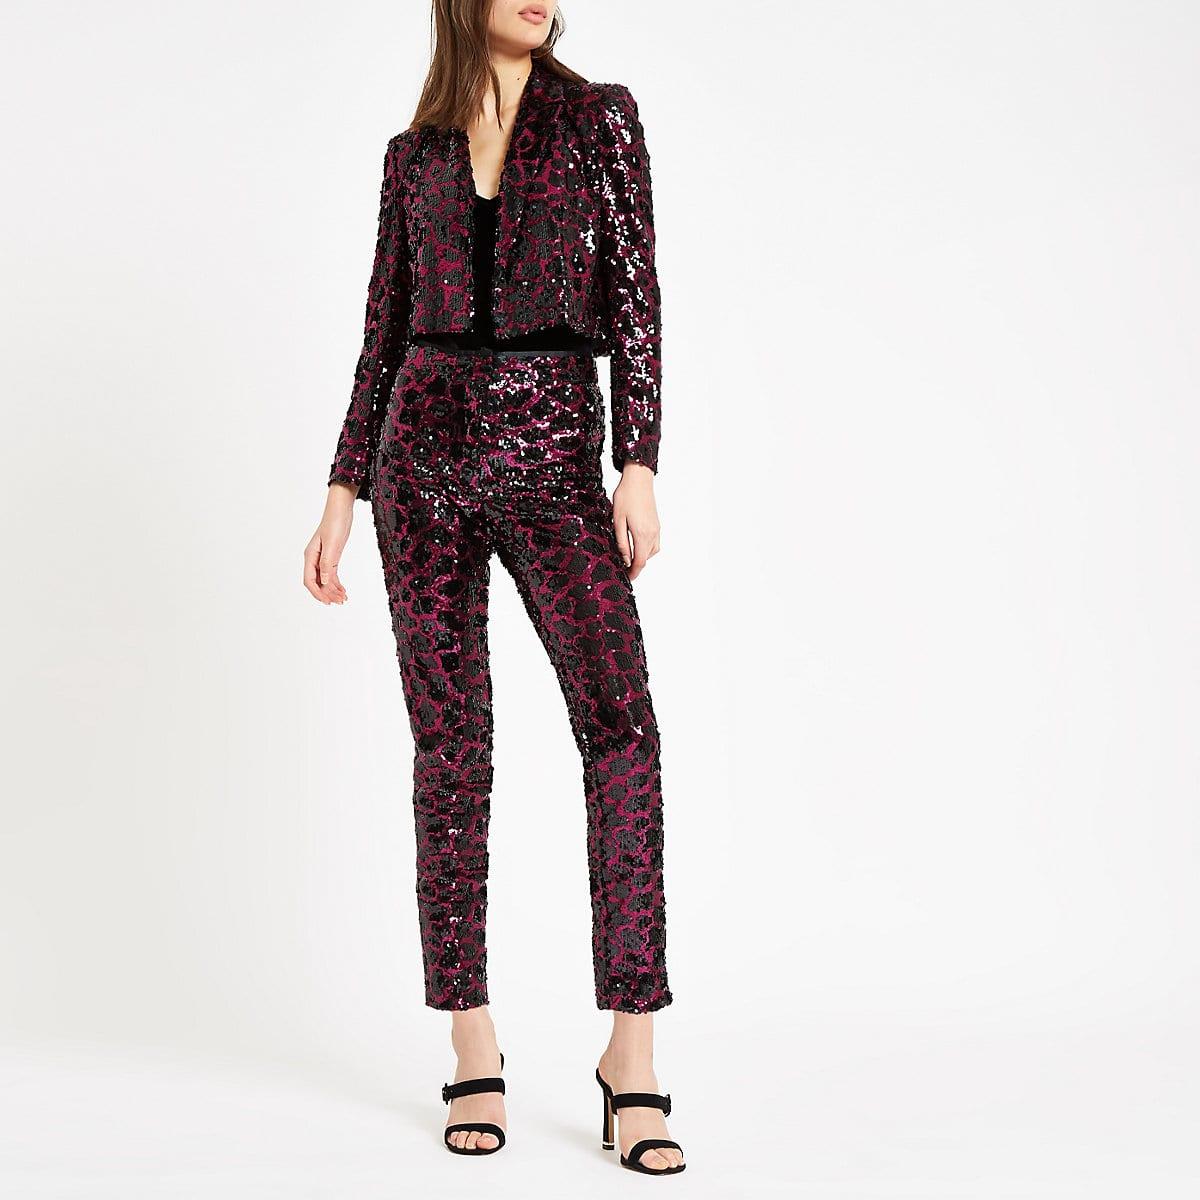 Blazers Dublin: Pink Leopard Print Sequin Blazer, €87